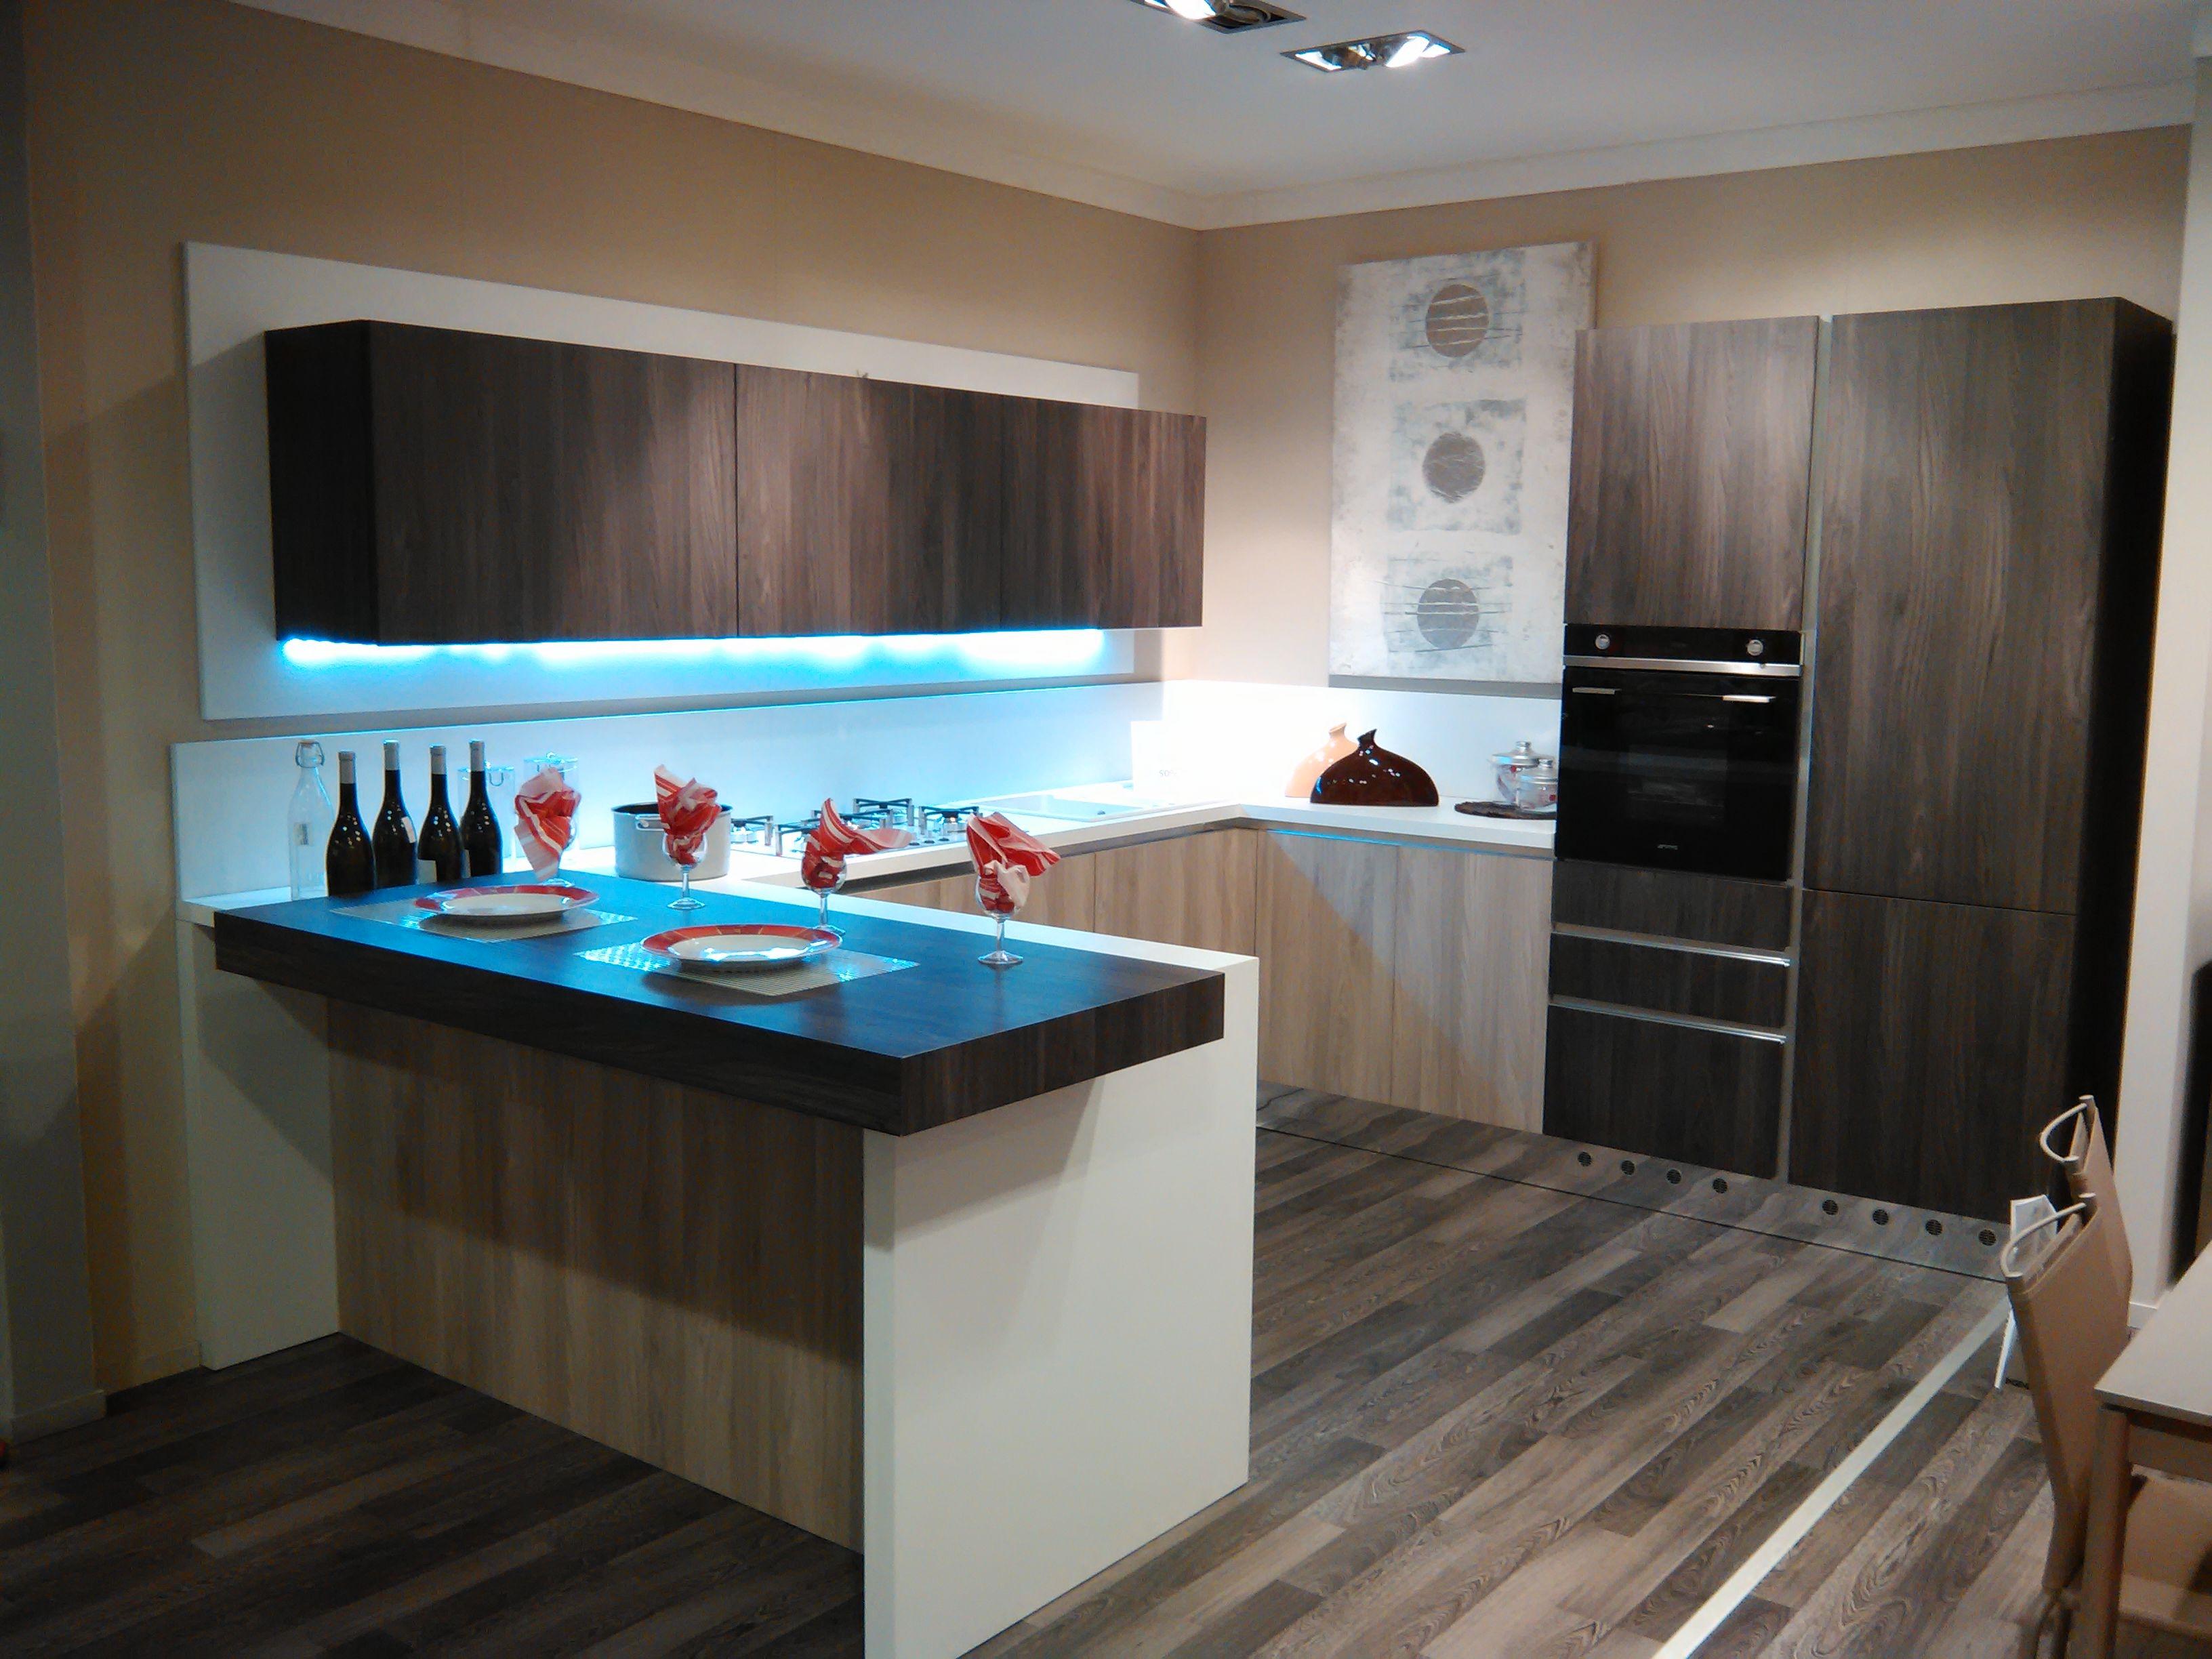 Cucine In Saldo - Idee Per La Casa - Douglasfalls.com